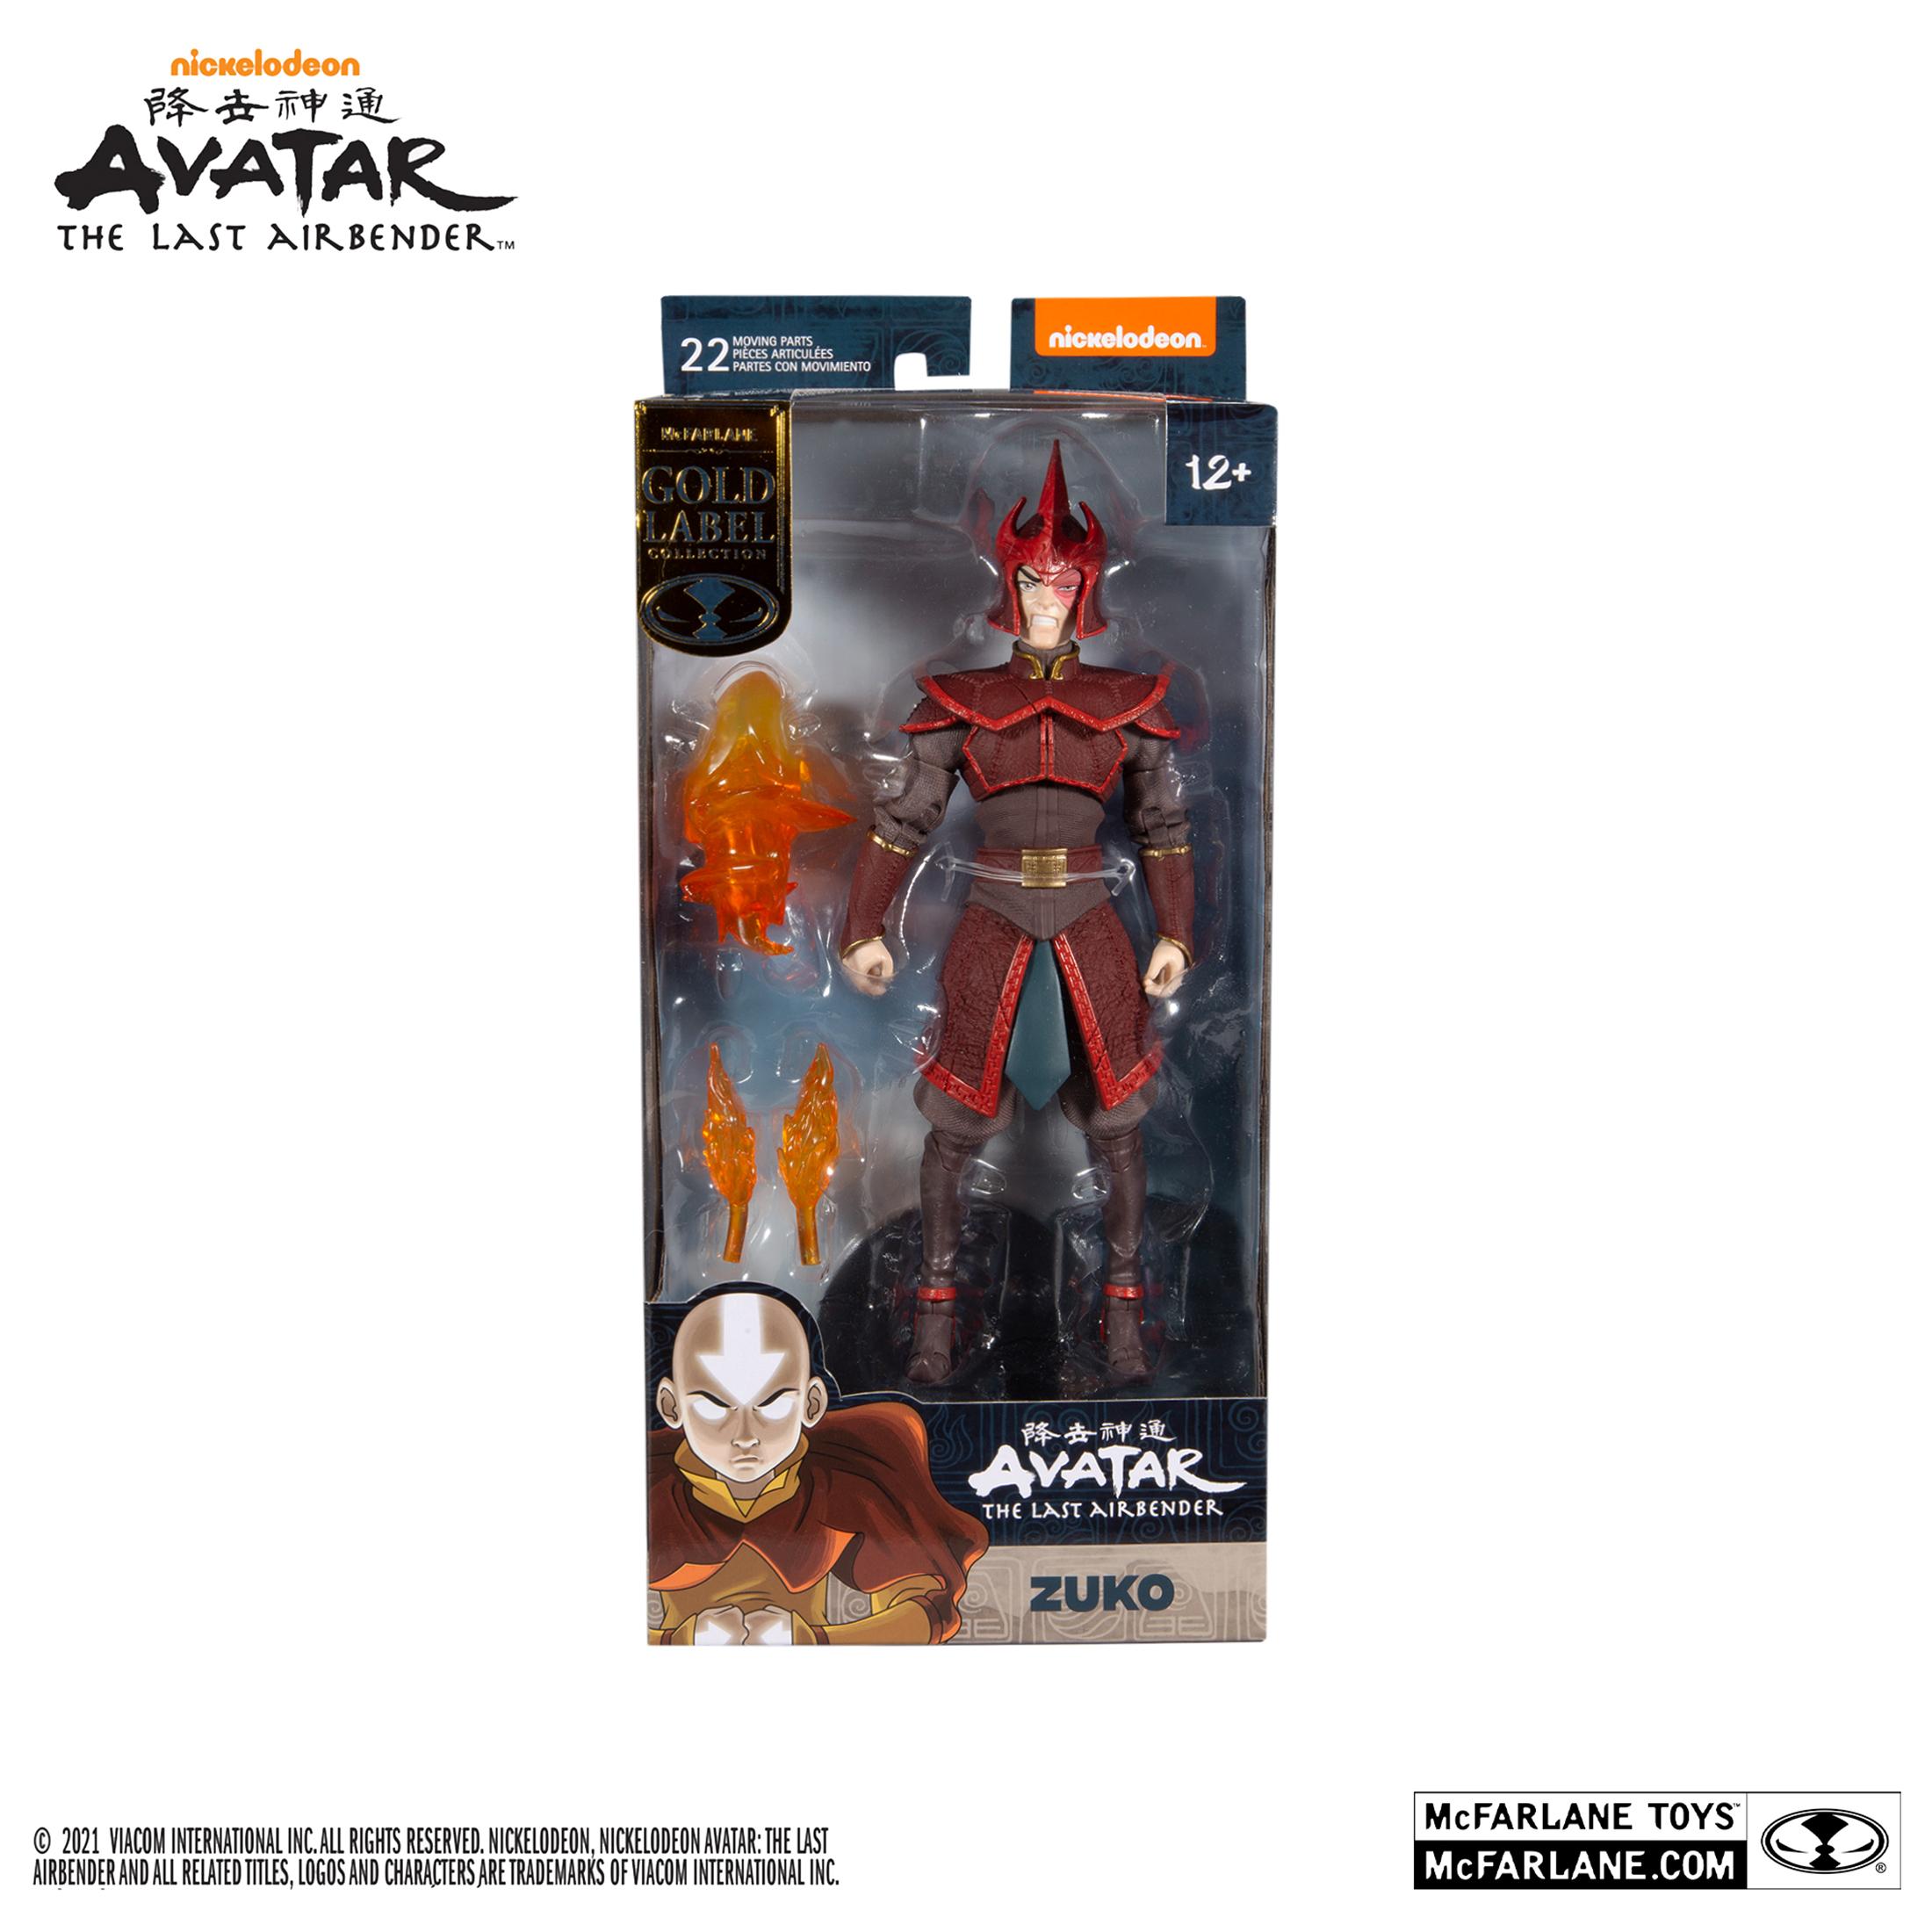 Avatar: The Last Airbender - Helmeted Zuko 7 Action Figure